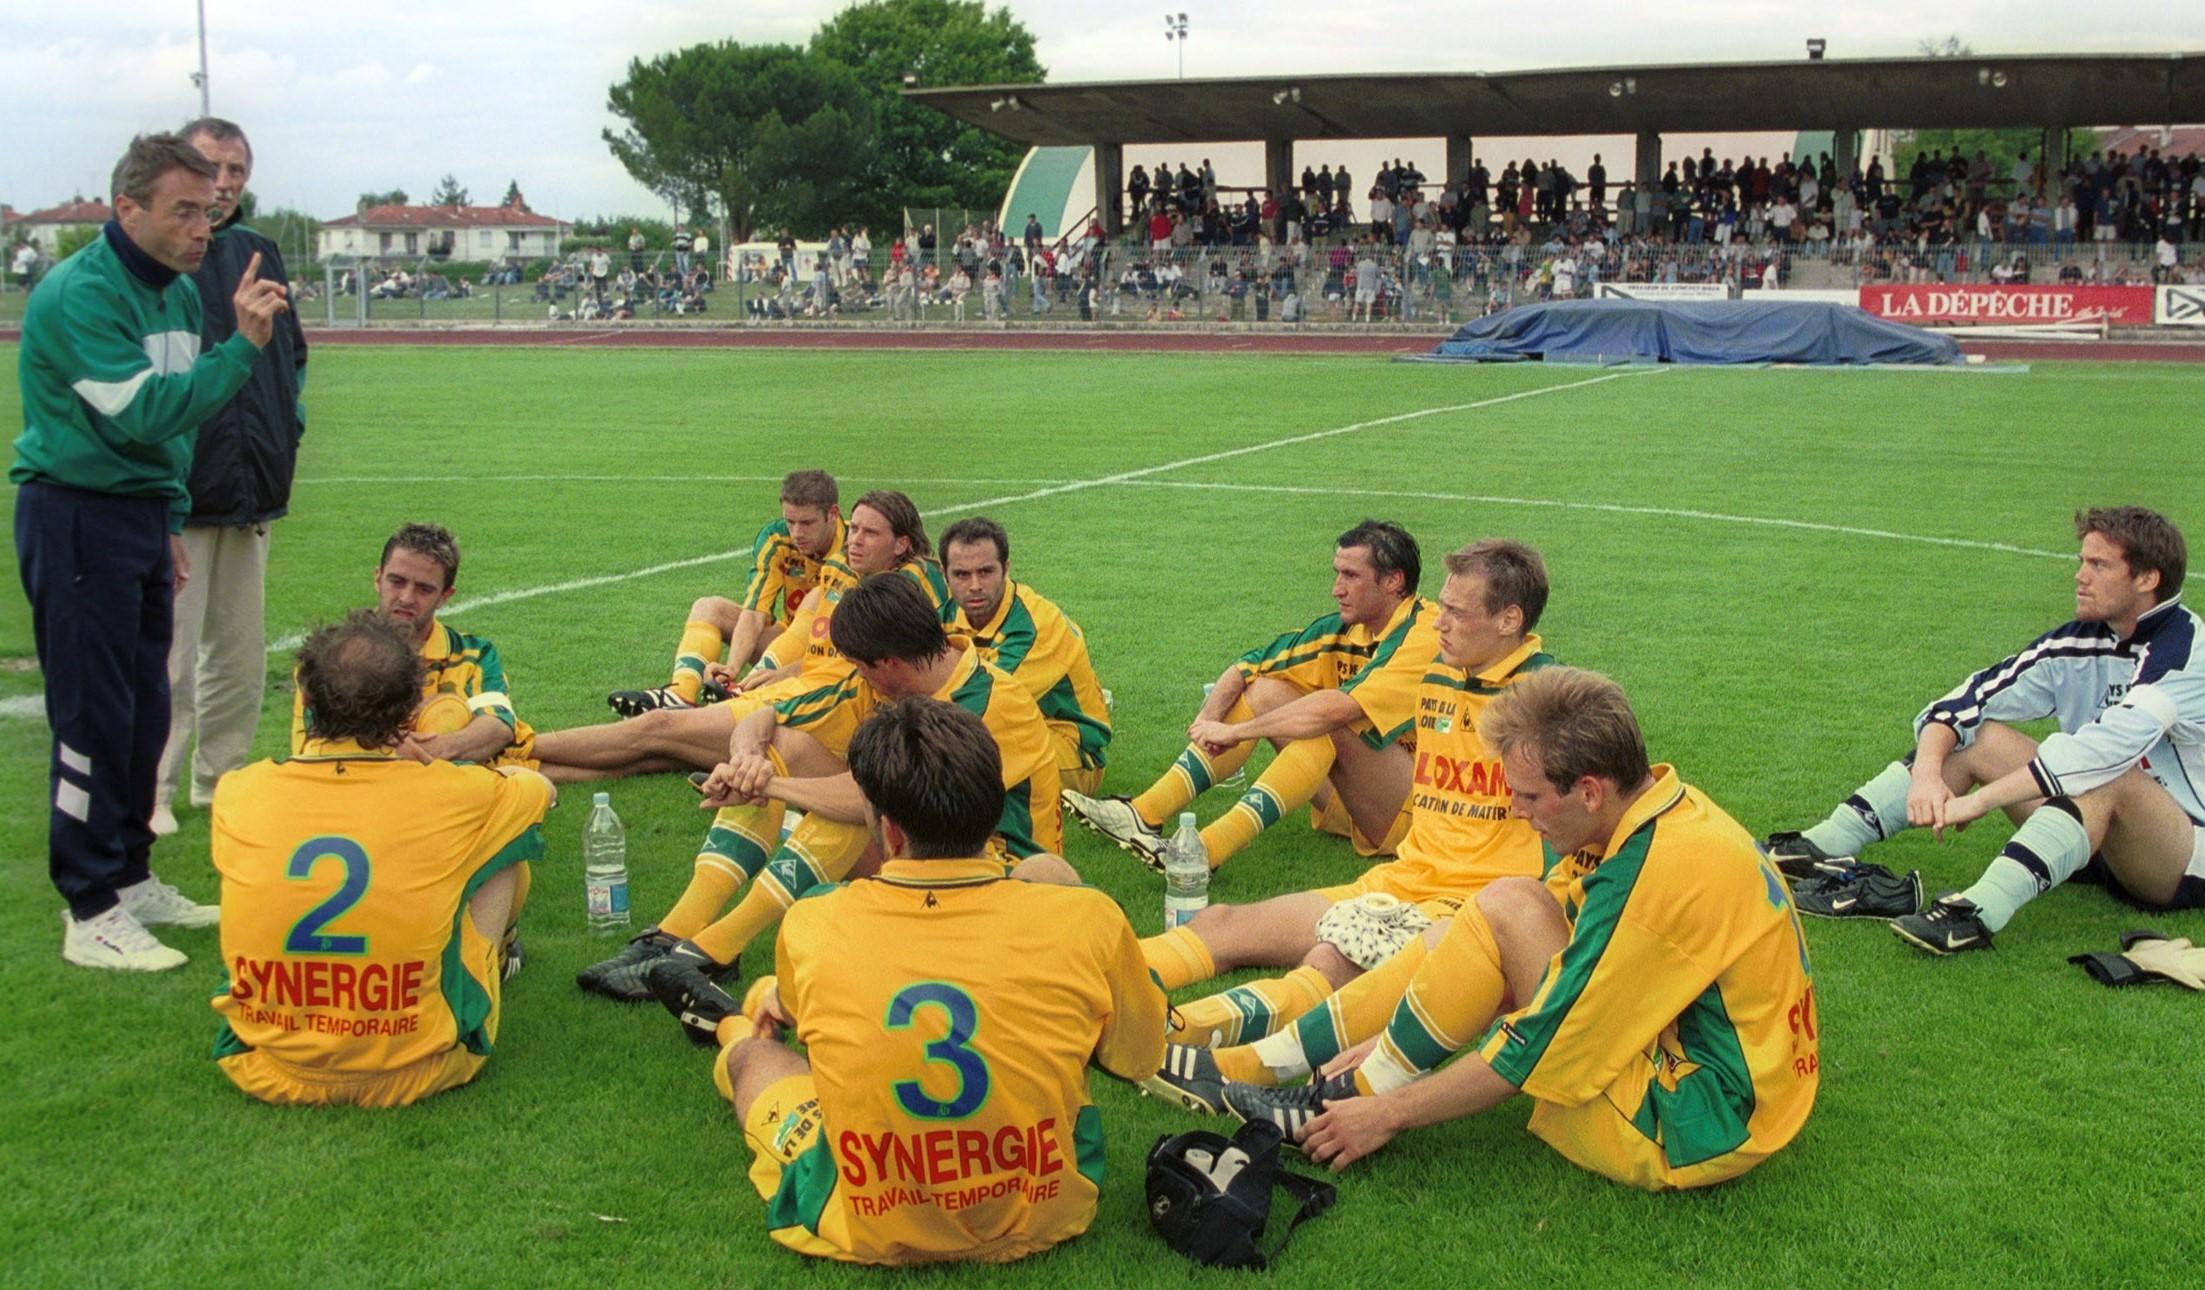 Football - Ligue 1 - Web-série (6/9) : Raynald Denoueix, dernier héritier du «jeu à la nantaise»